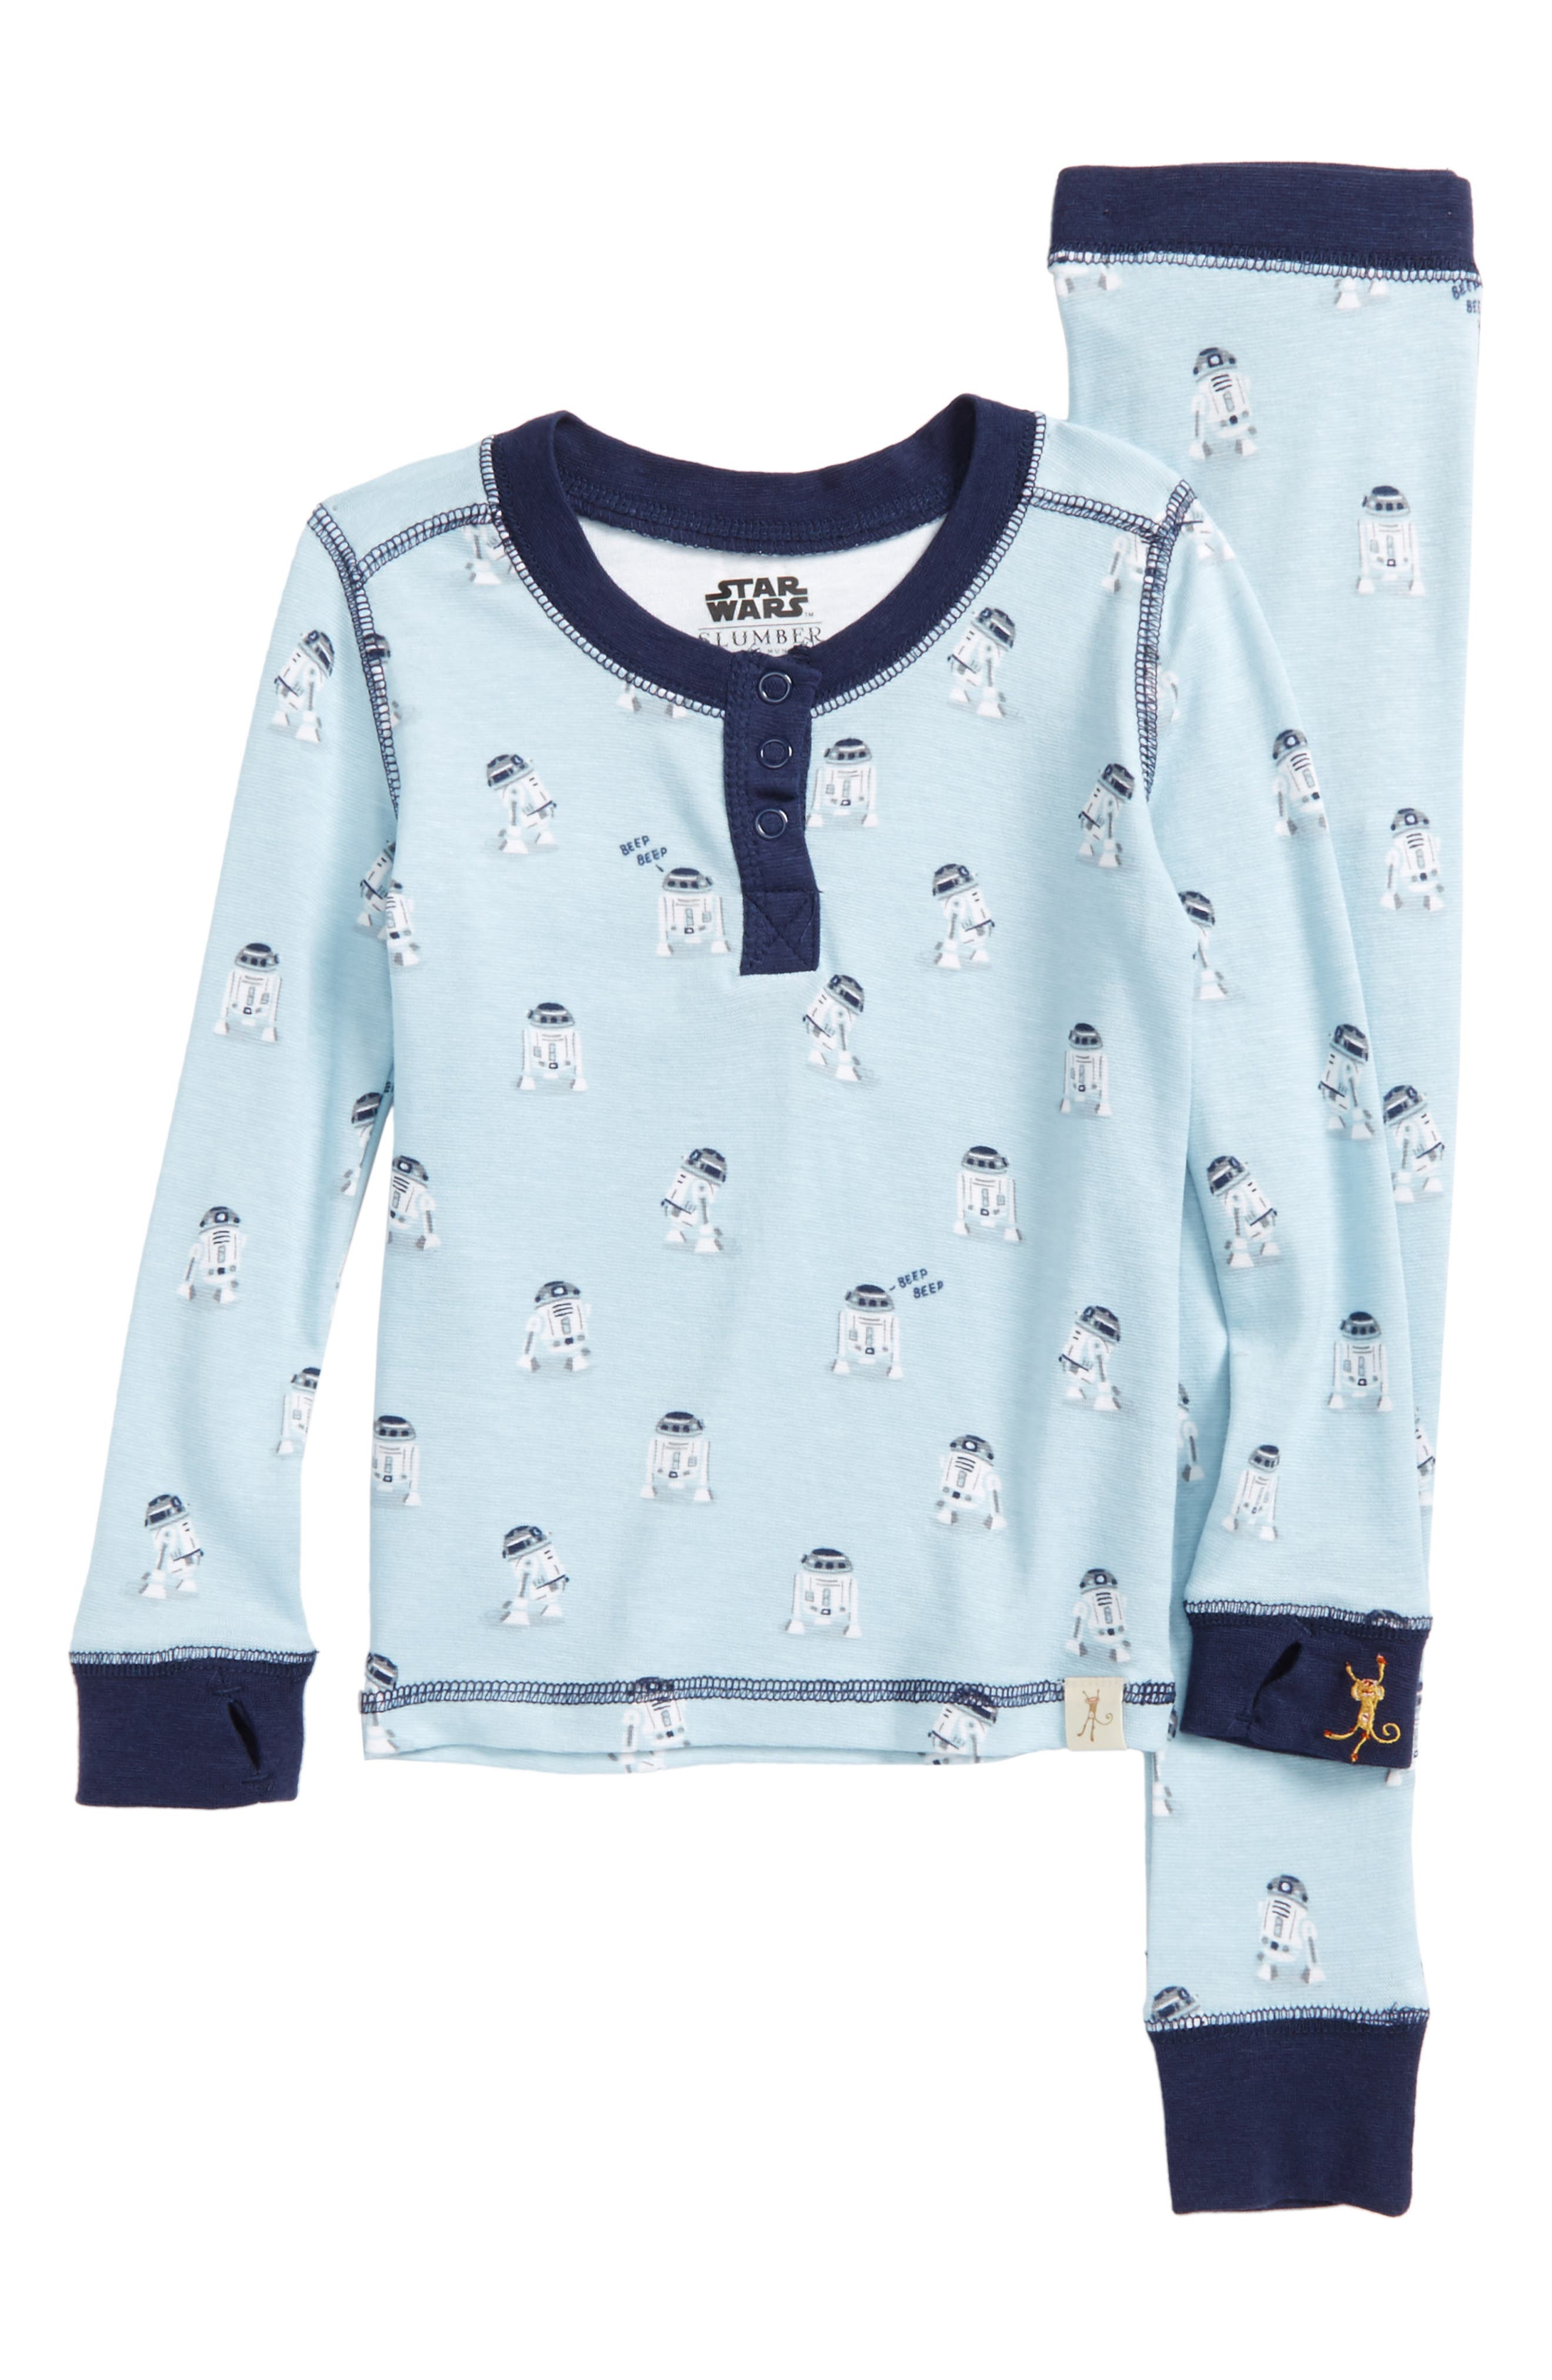 Munki Munki Star Wars™ - R2-D2 Fitted Two-Piece Pajamas (Toddler Boys, Little Boys & Big Boys)